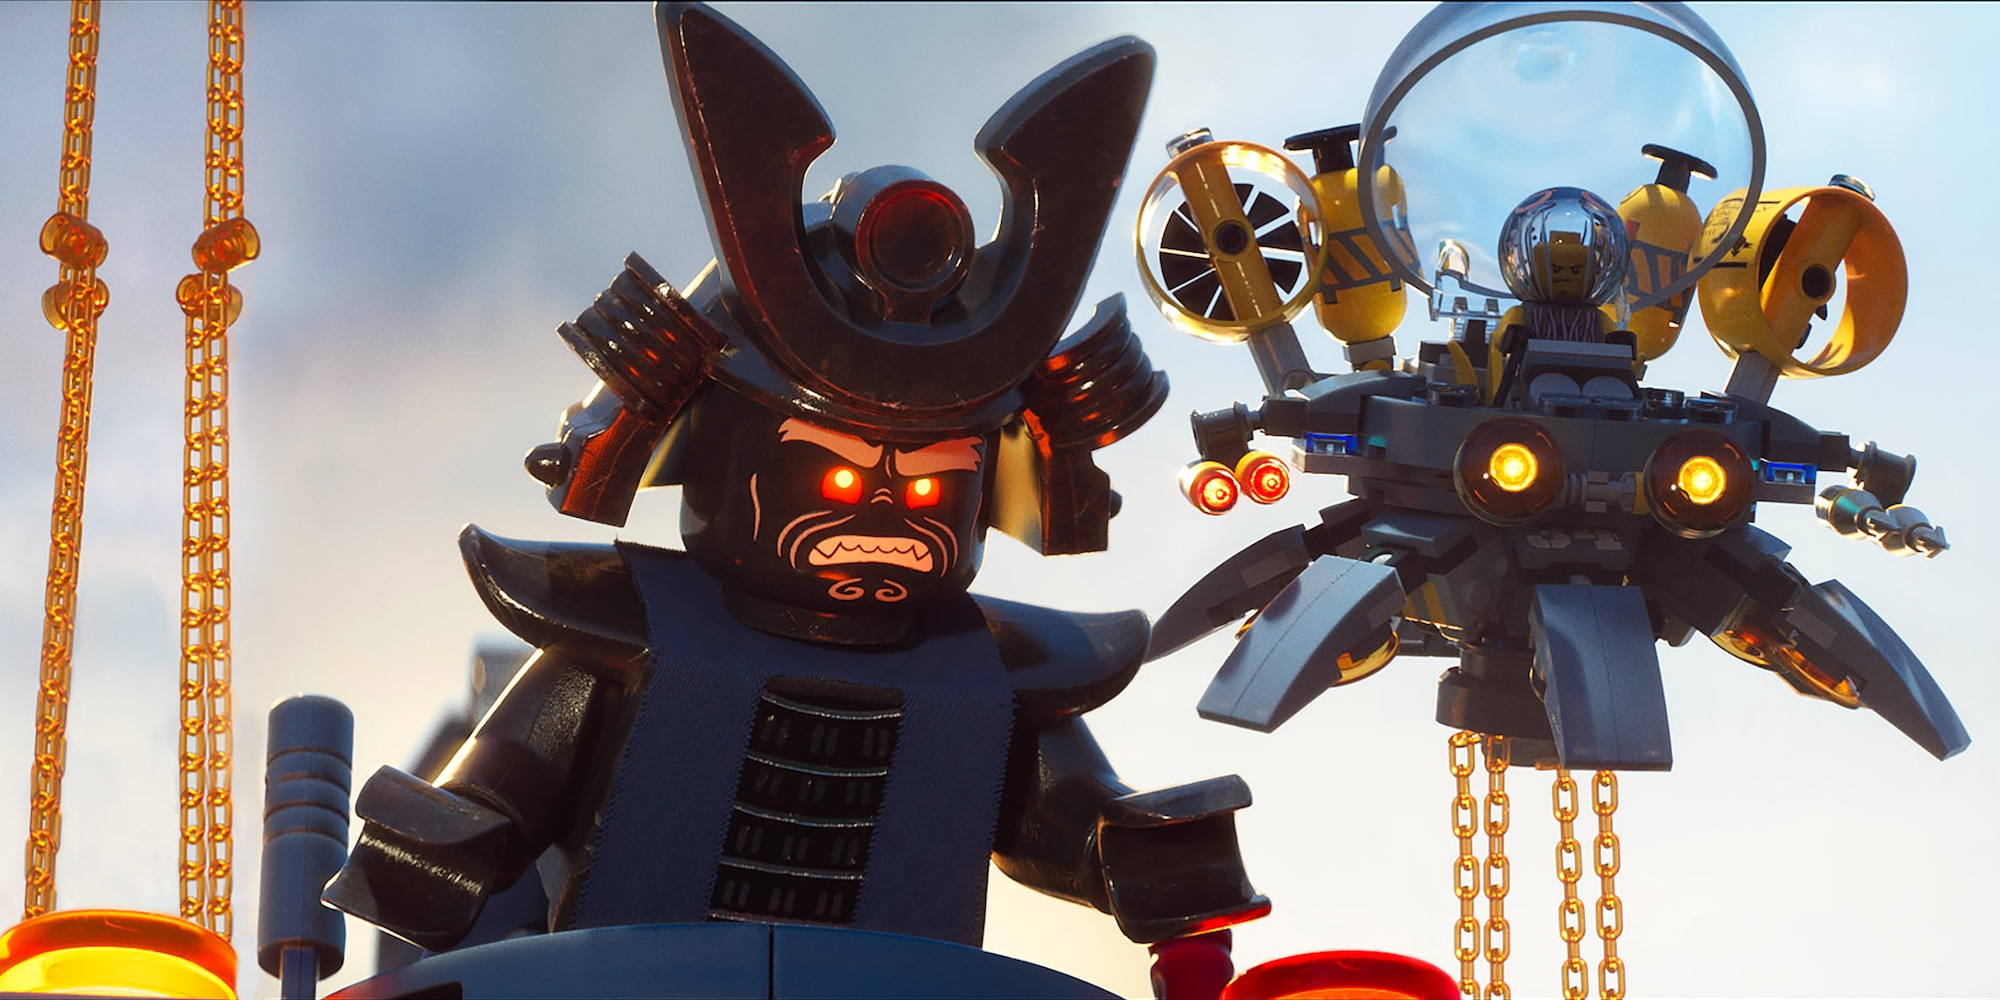 LEGO Ninjago Movie Toy Sets Revealed